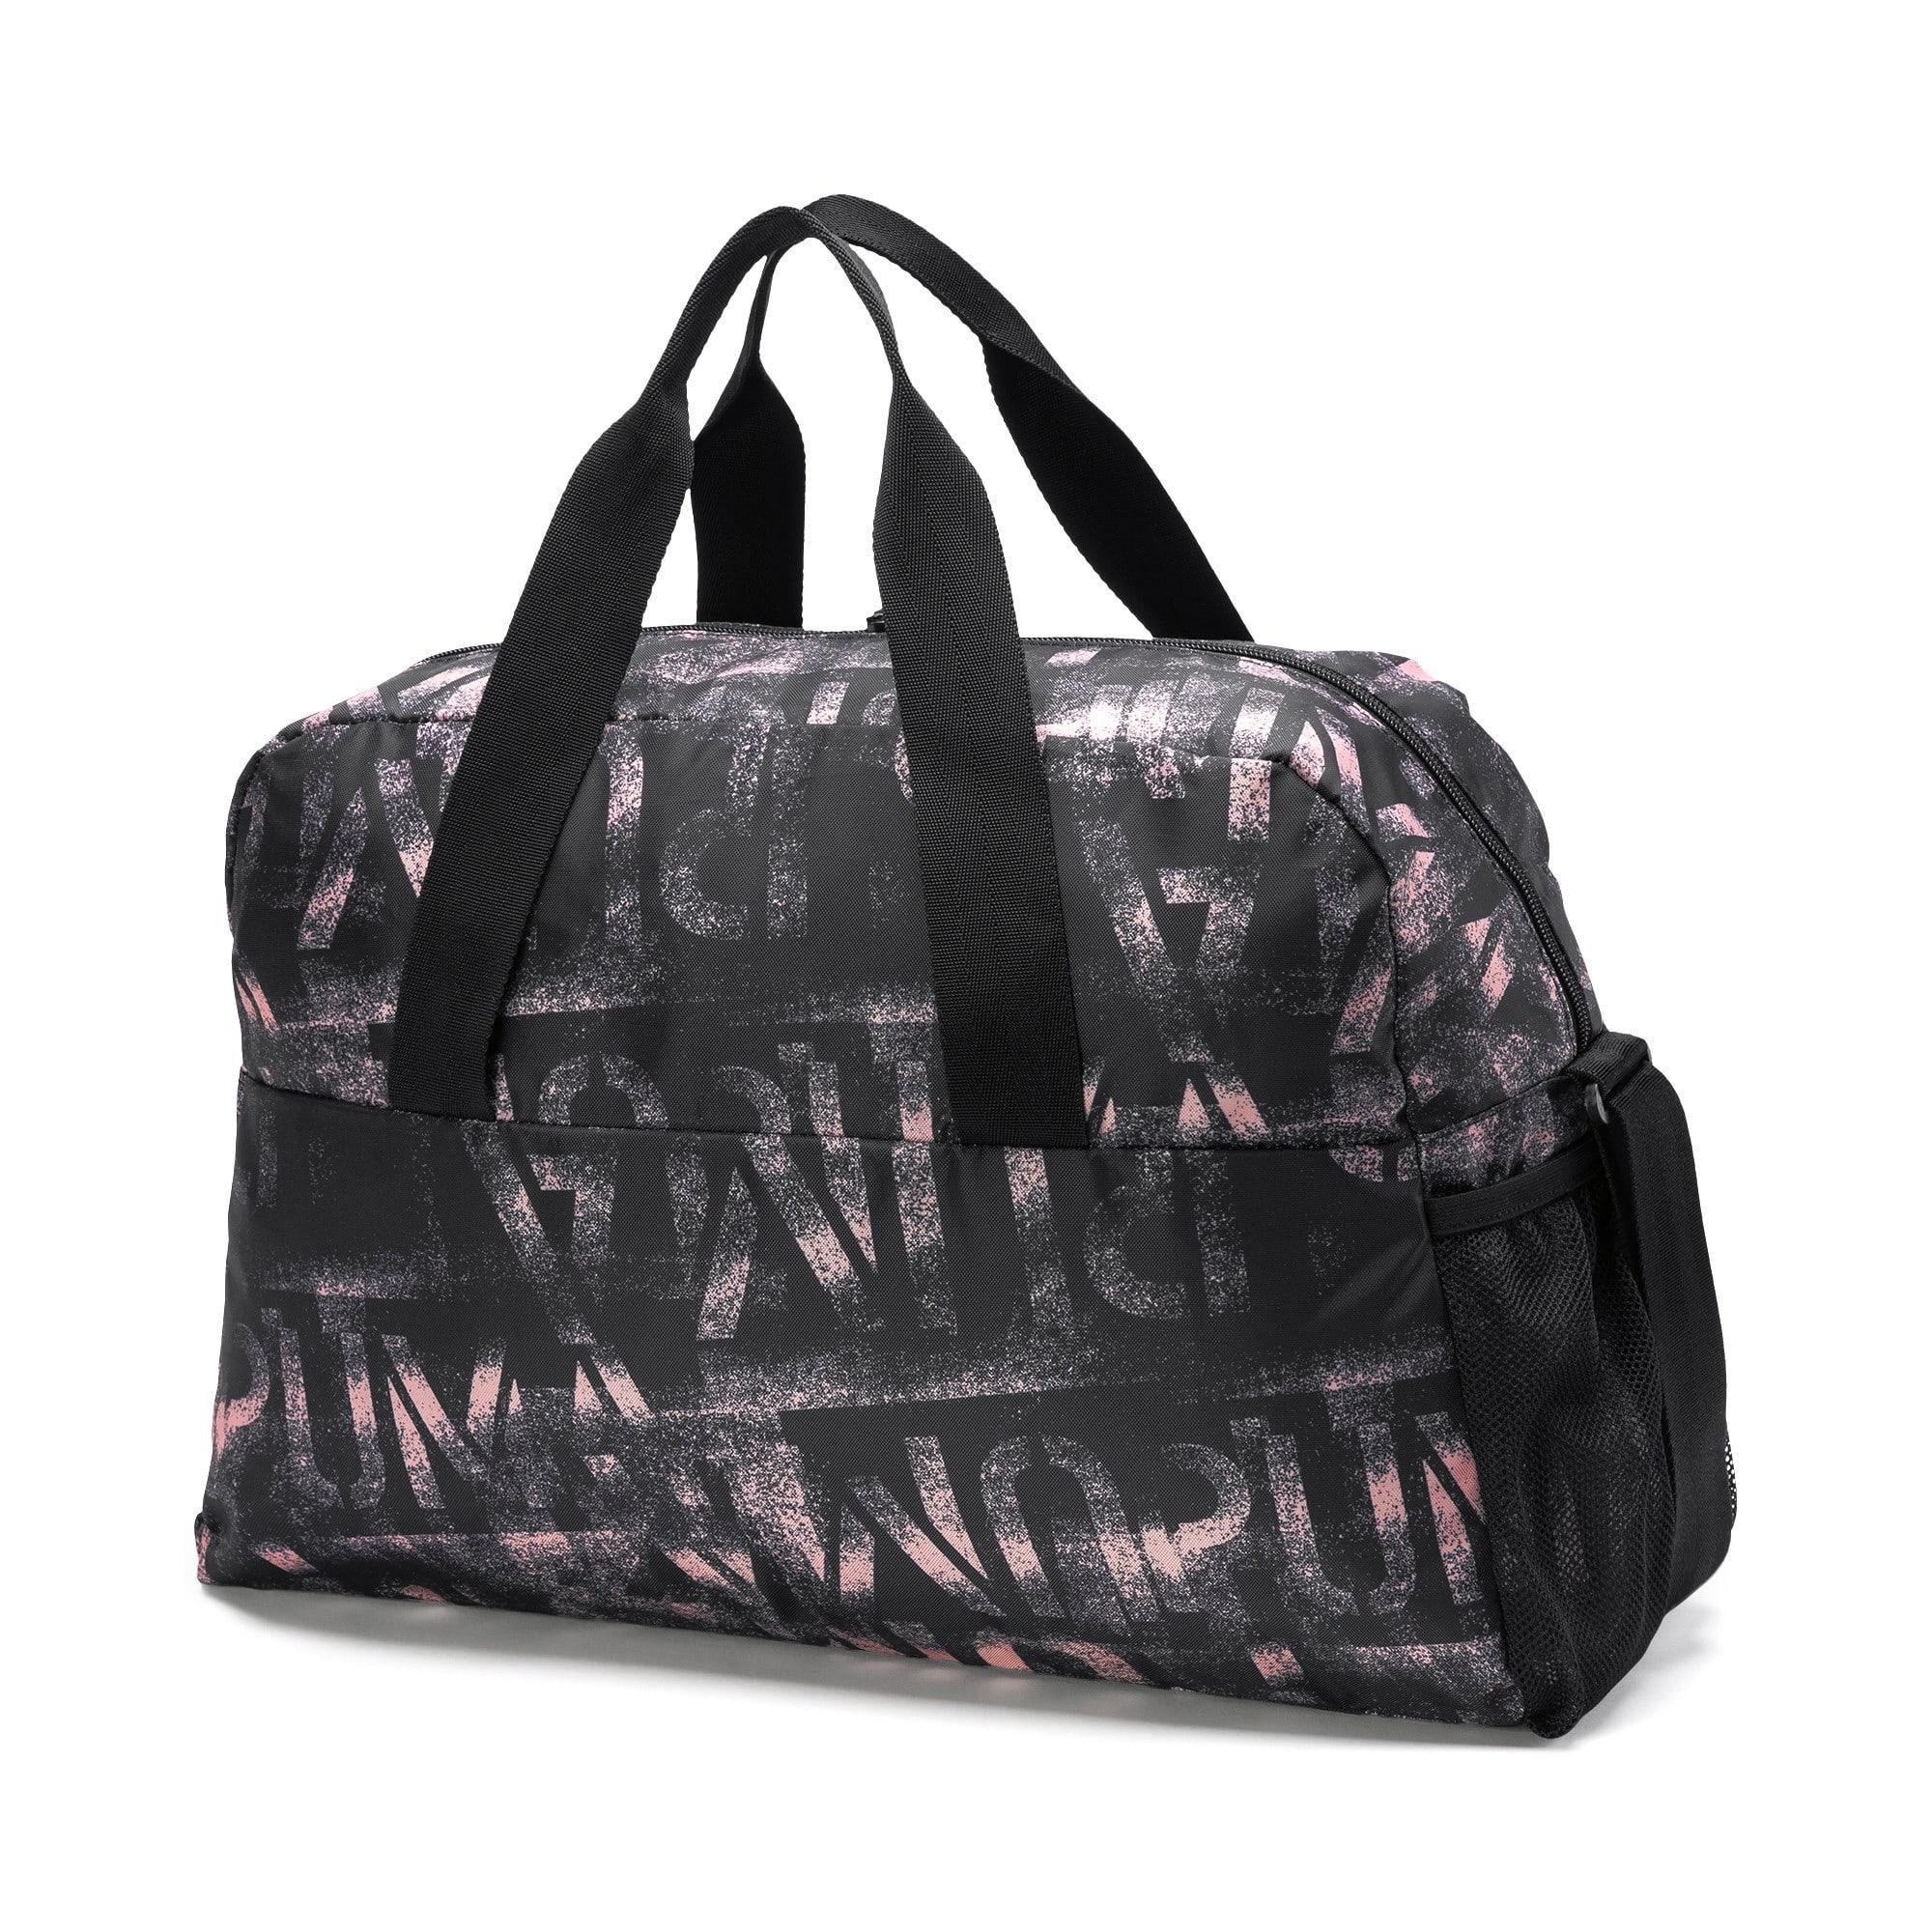 Thumbnail 3 of AT ESS Grip Bag, Puma Black-Bridal Rose-AOP, medium